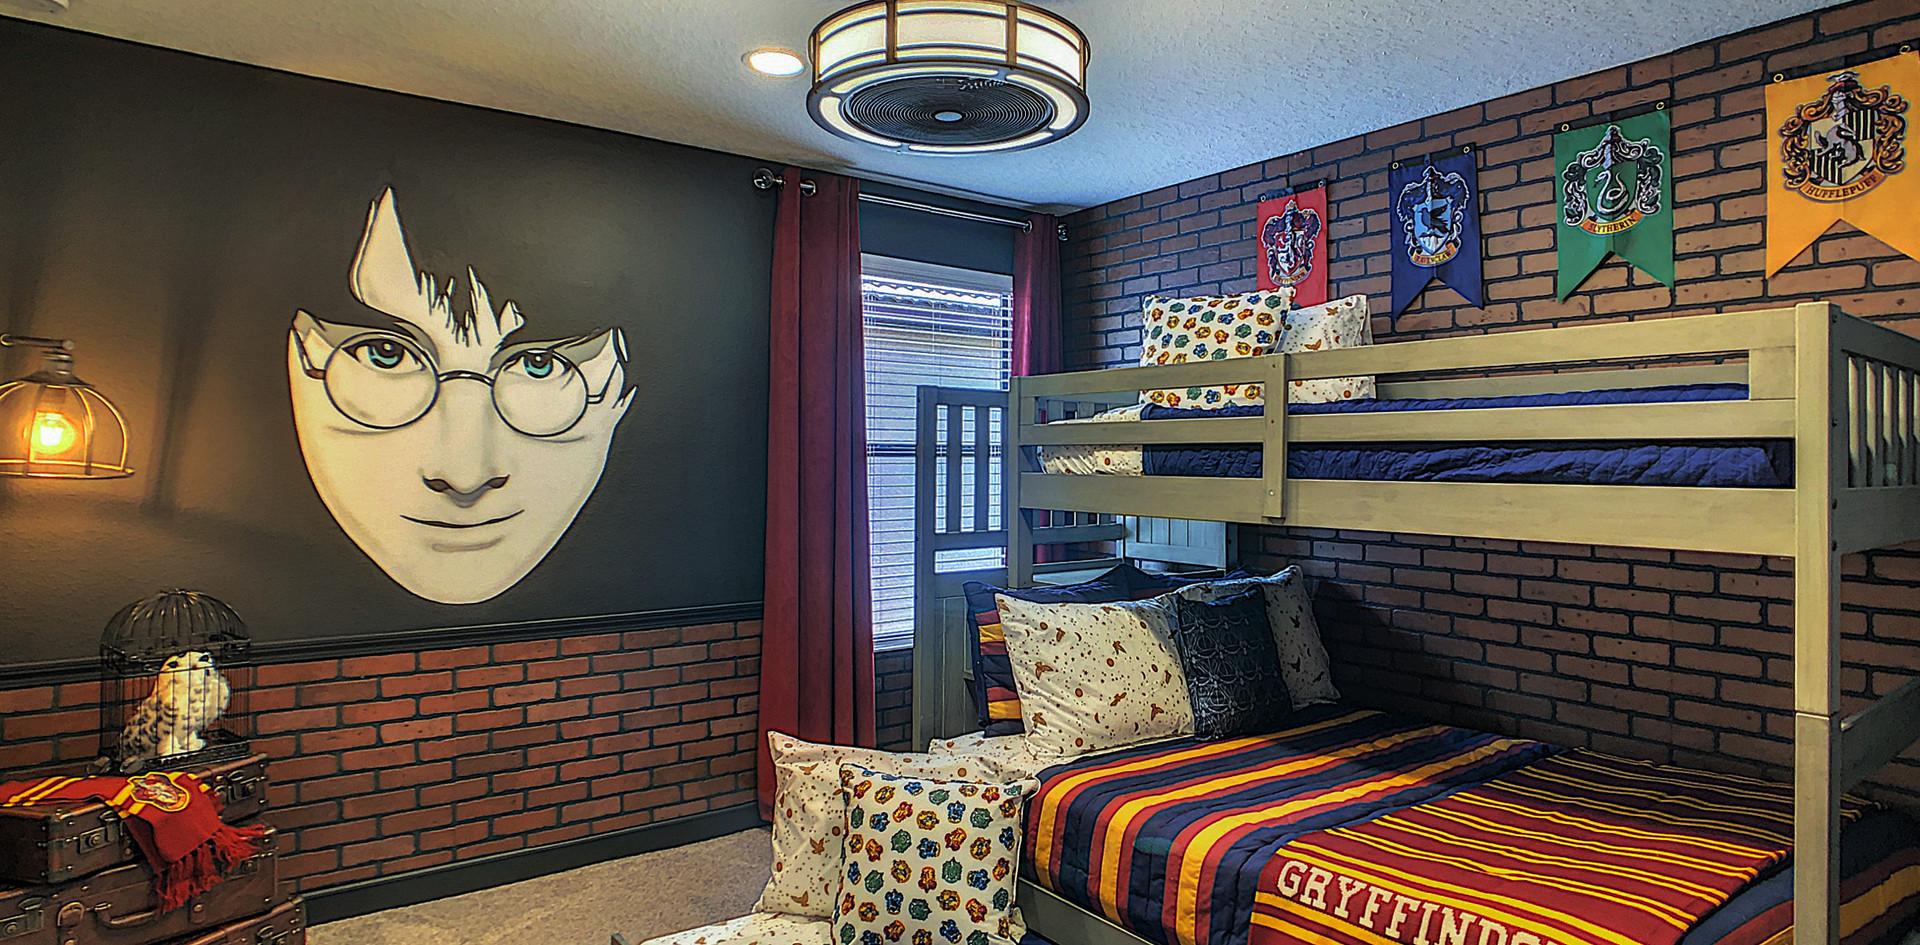 Destination Starship - Harry Potter Bedroom